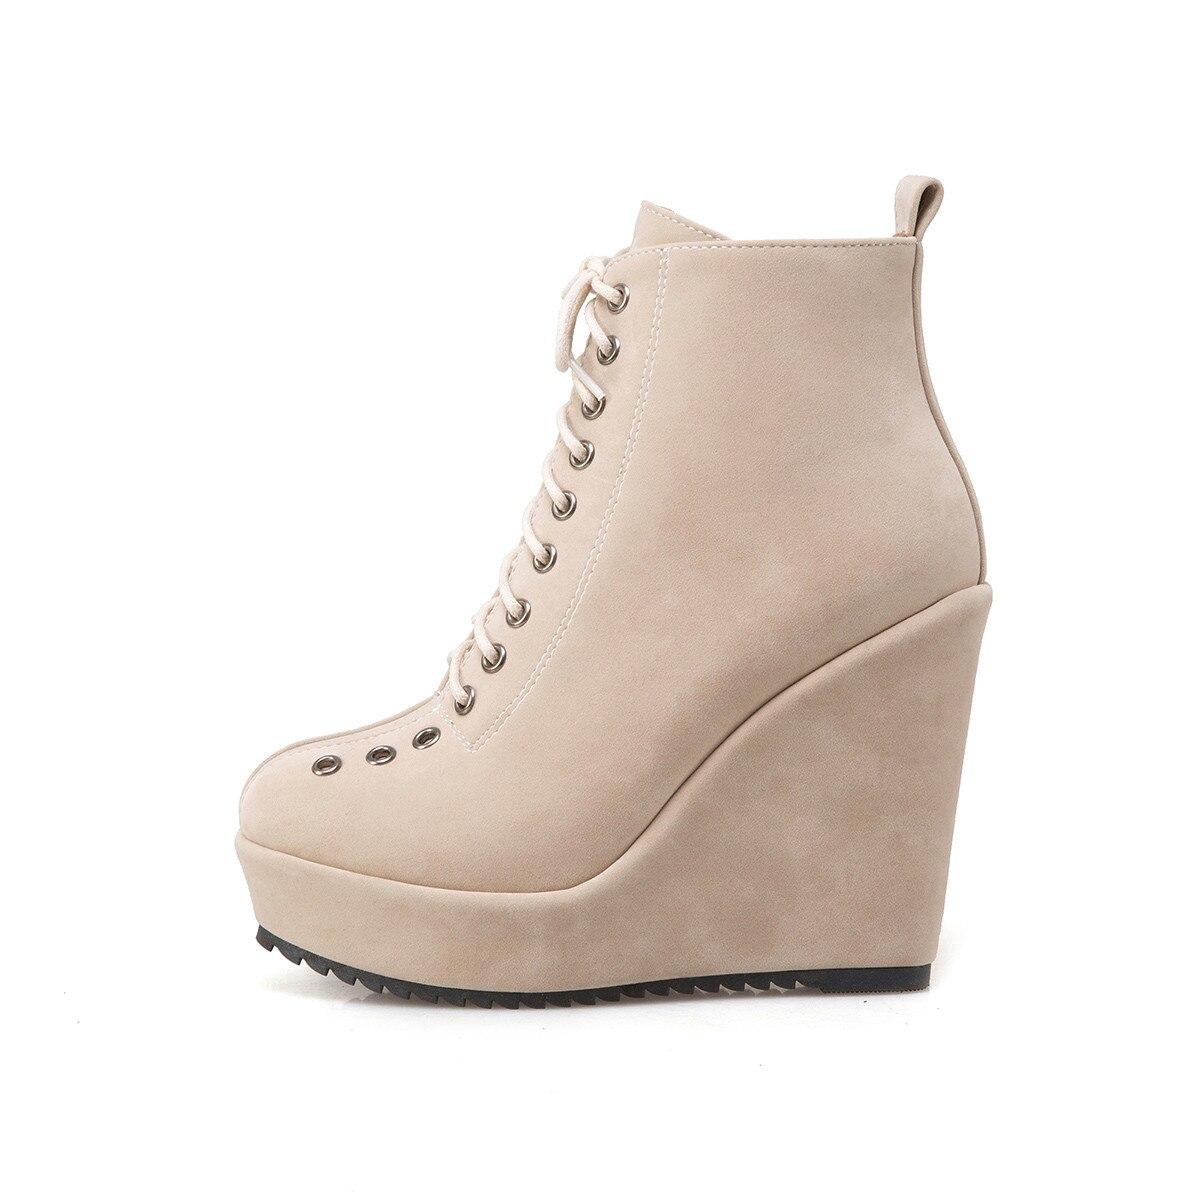 53116ea8687d8 Γυναικεία παπούτσια BONJOMARISA Women's Lace Up Vintage High Heel Wedge  Shoes Woman Round Toe Platform Ankle Boots Big Size 34-43